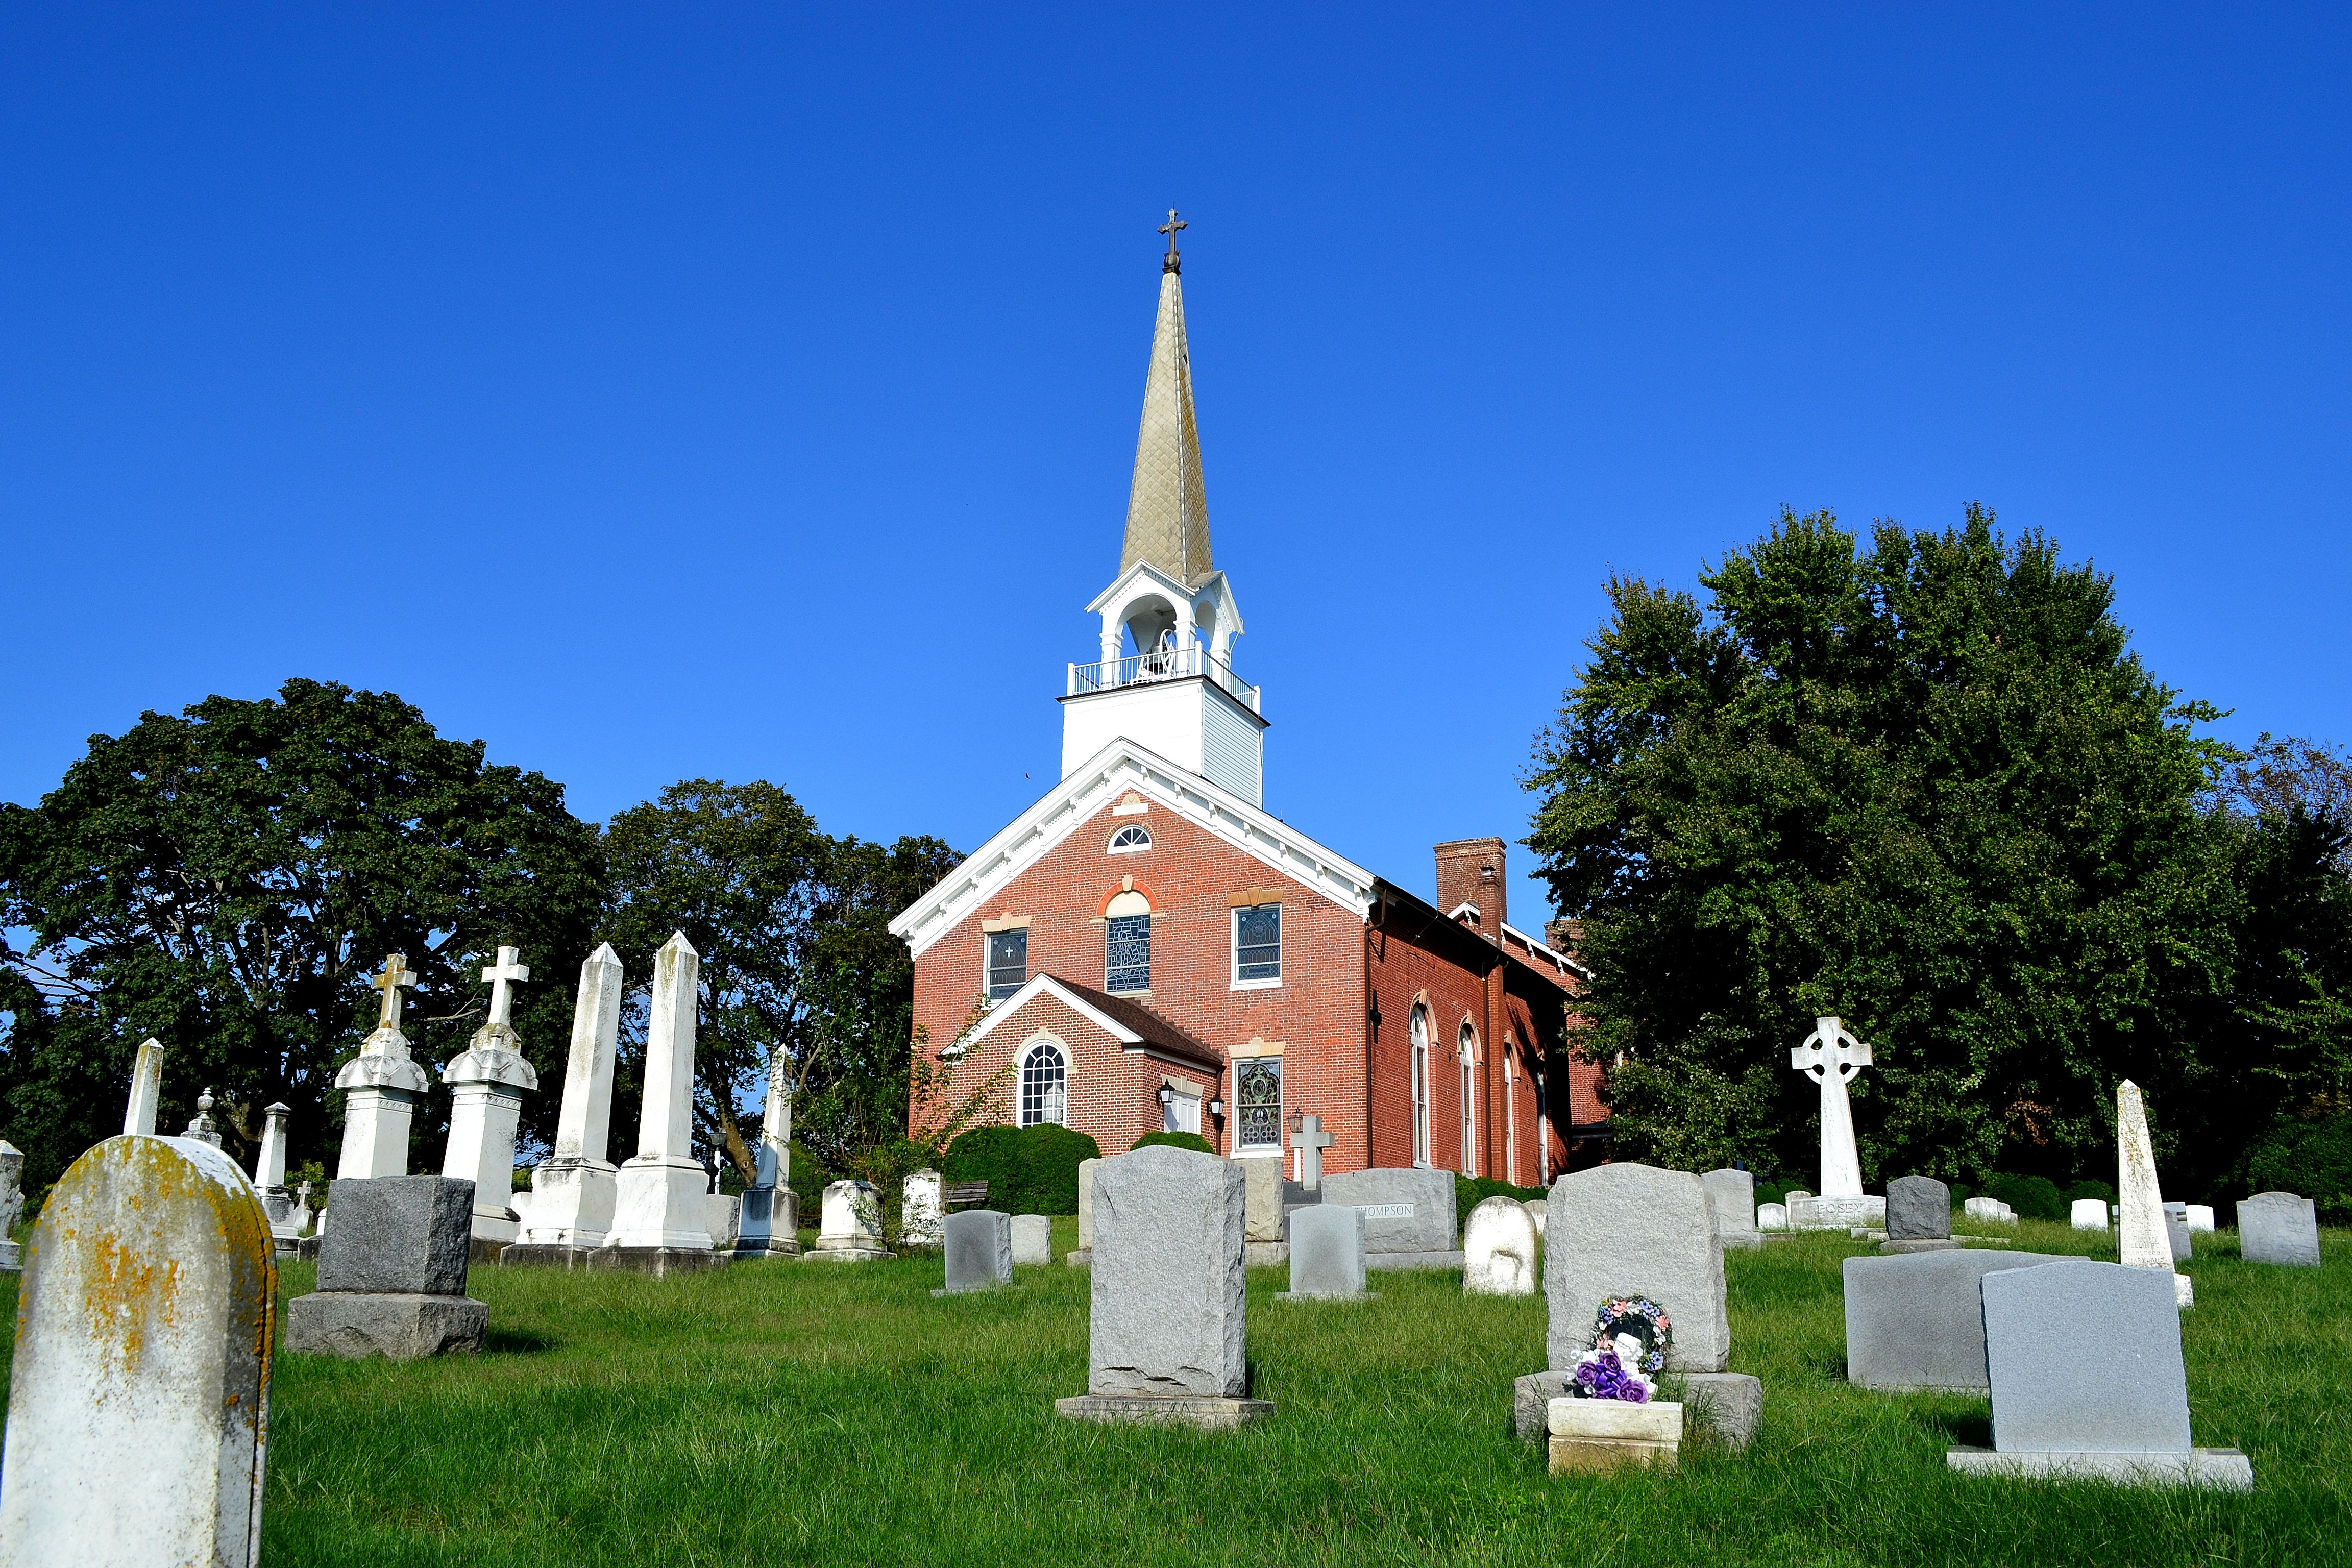 Steeple clipart religious freedom 1 Destination Religious  Scenic